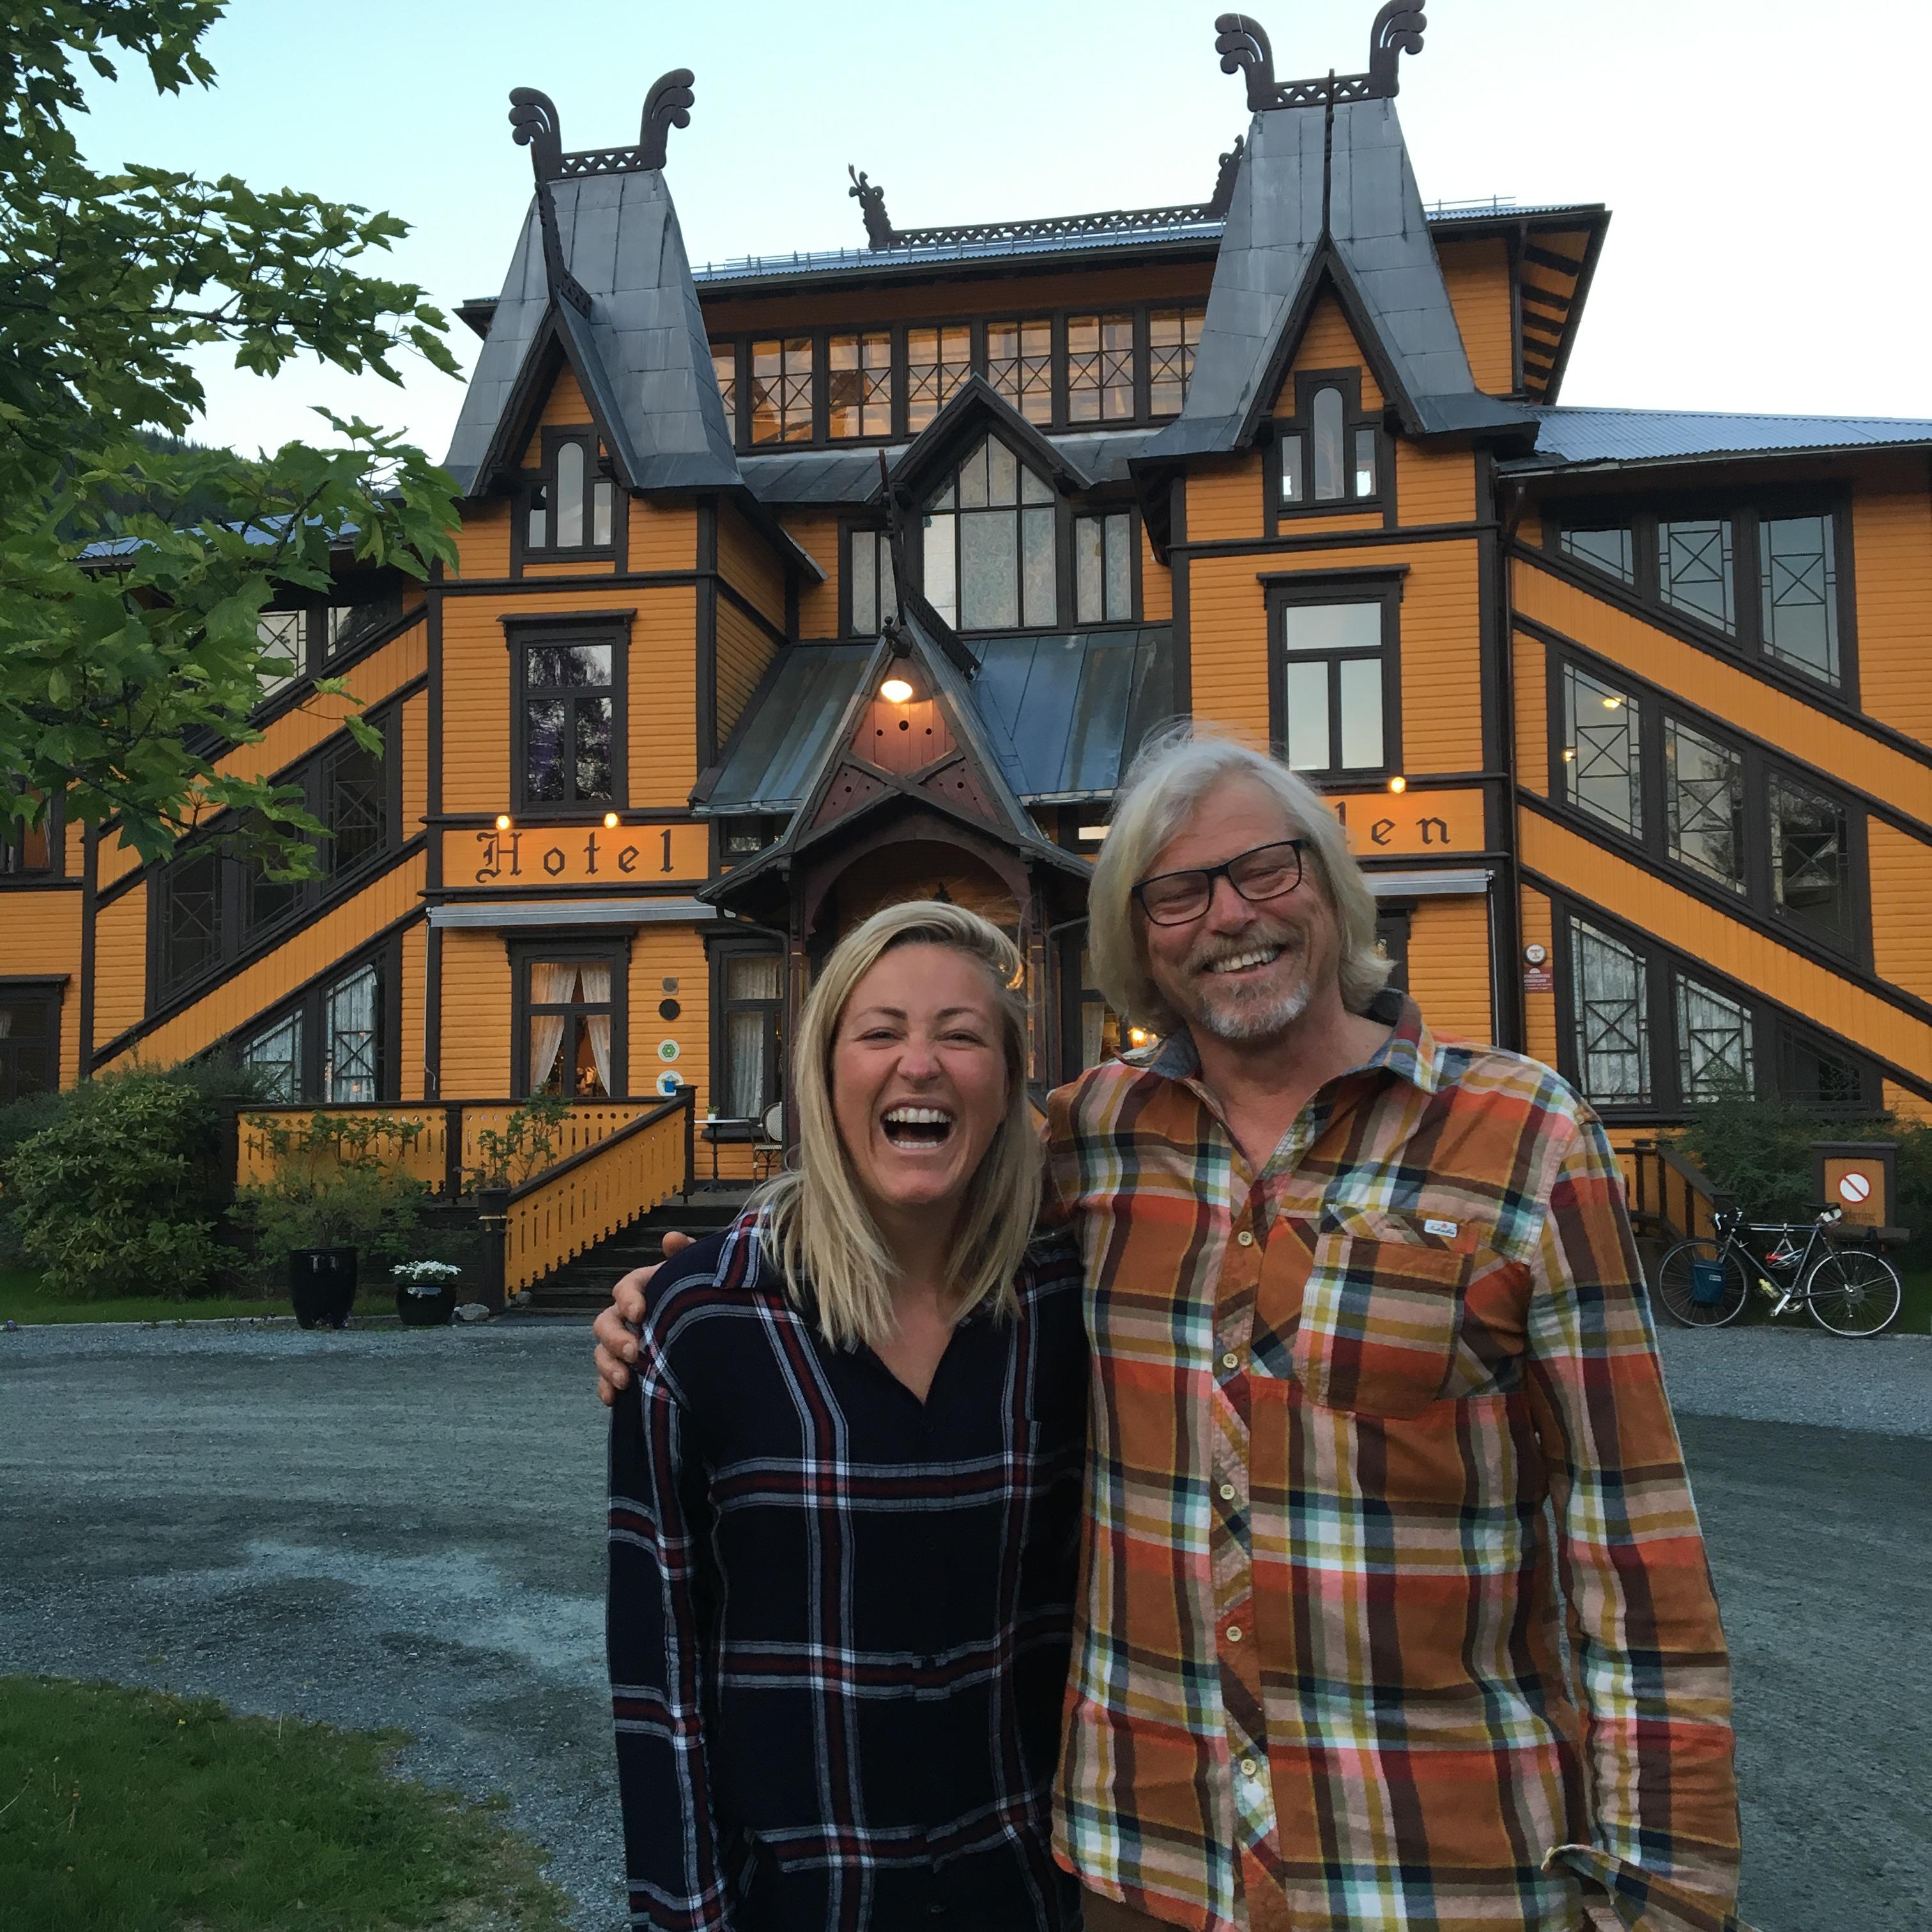 Stine møtte naturentusiasten Jostein Hellevik som driver Dalen Villmarksenter på Dalen Hotel. Han er heller ikke telemarking men har forelsket seg helt i Dalen og flyttet hit fra Stavanger.